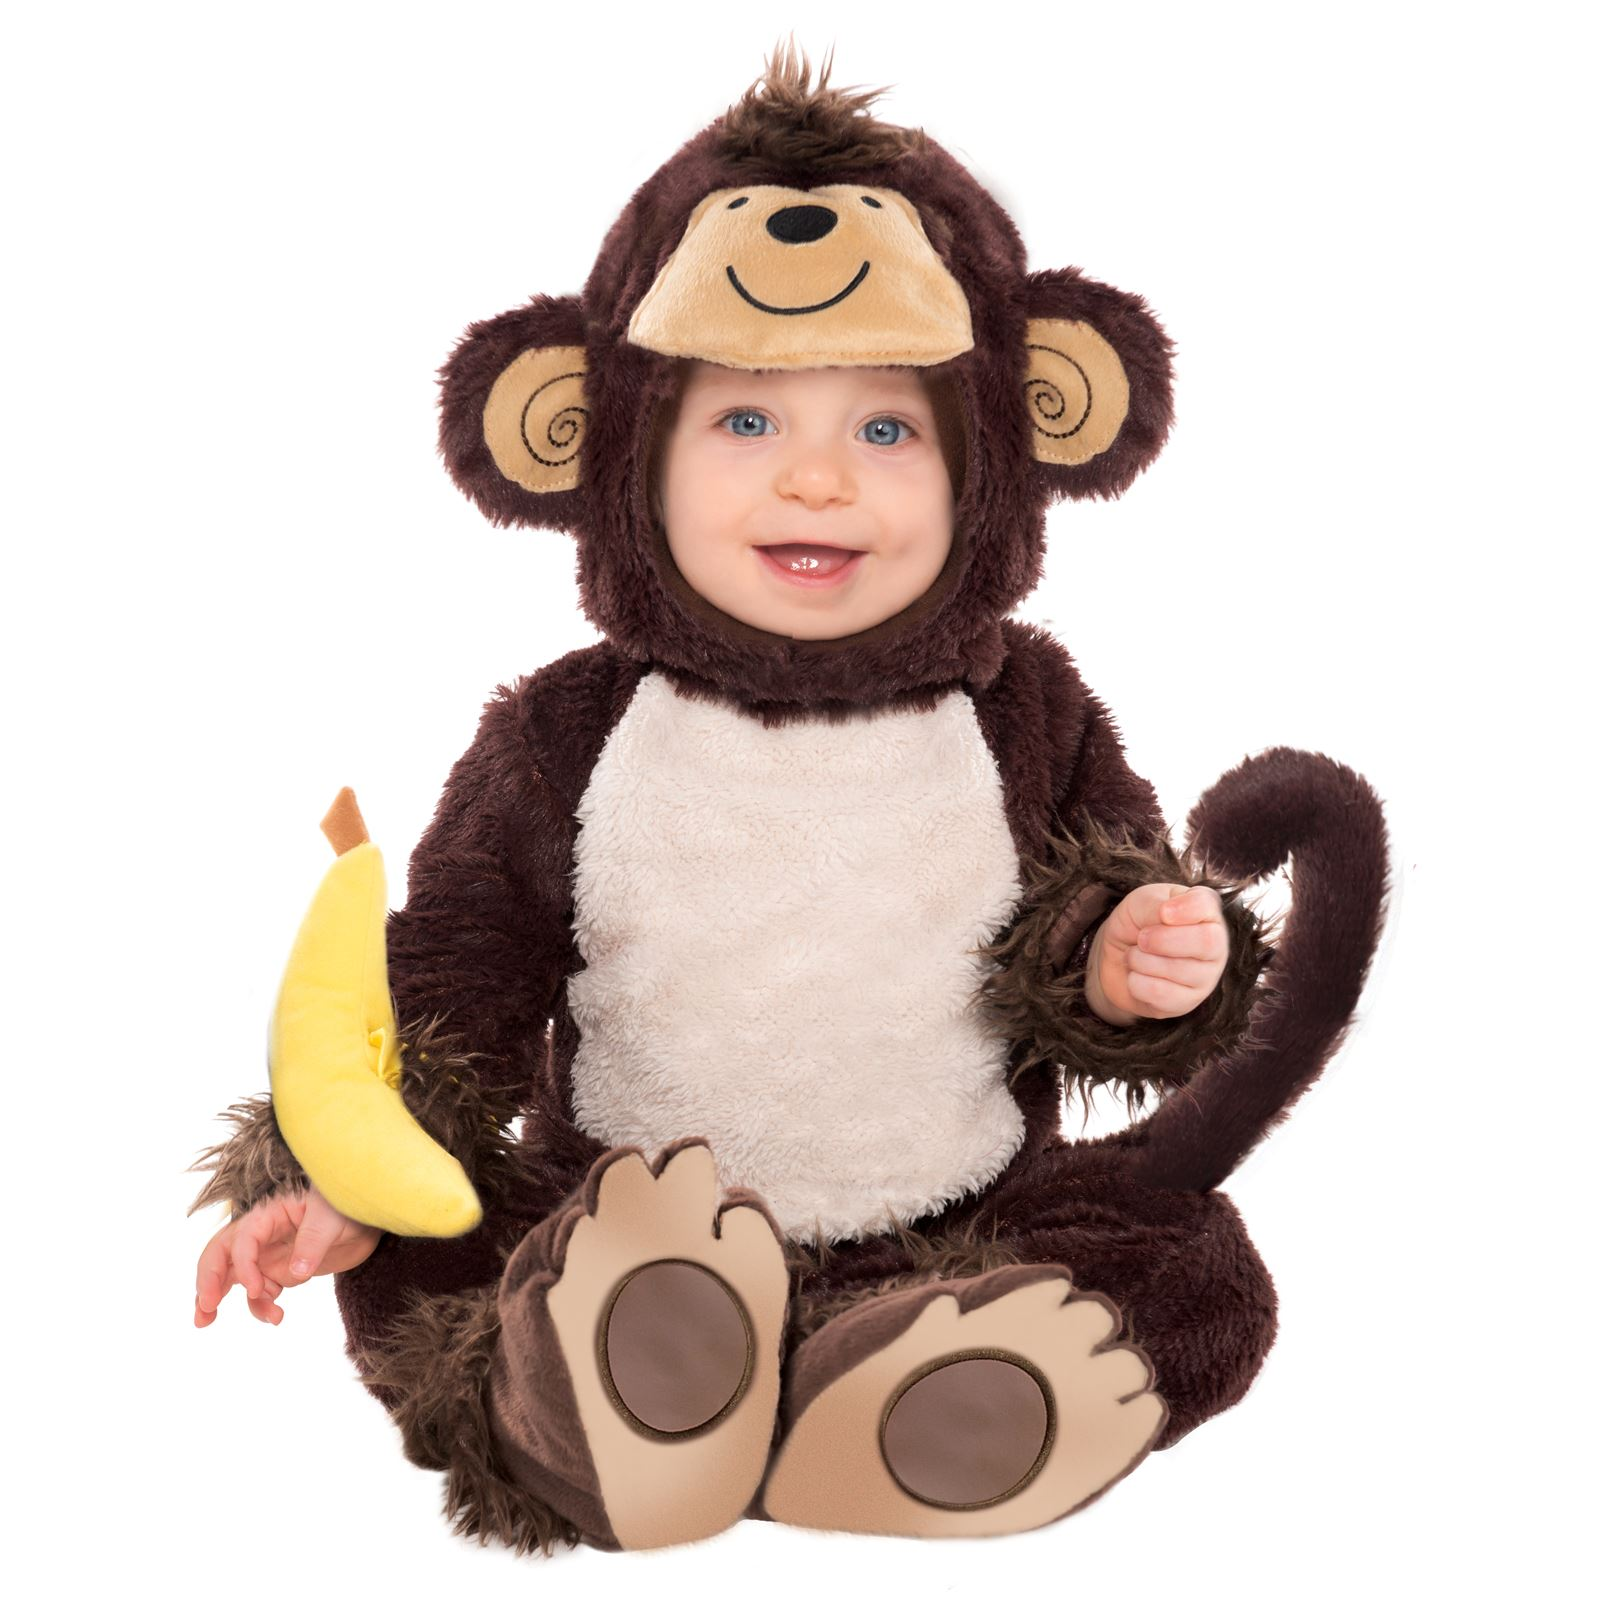 Cute Baby Monkey Jungle George Fur Costume All in One ... - photo#43